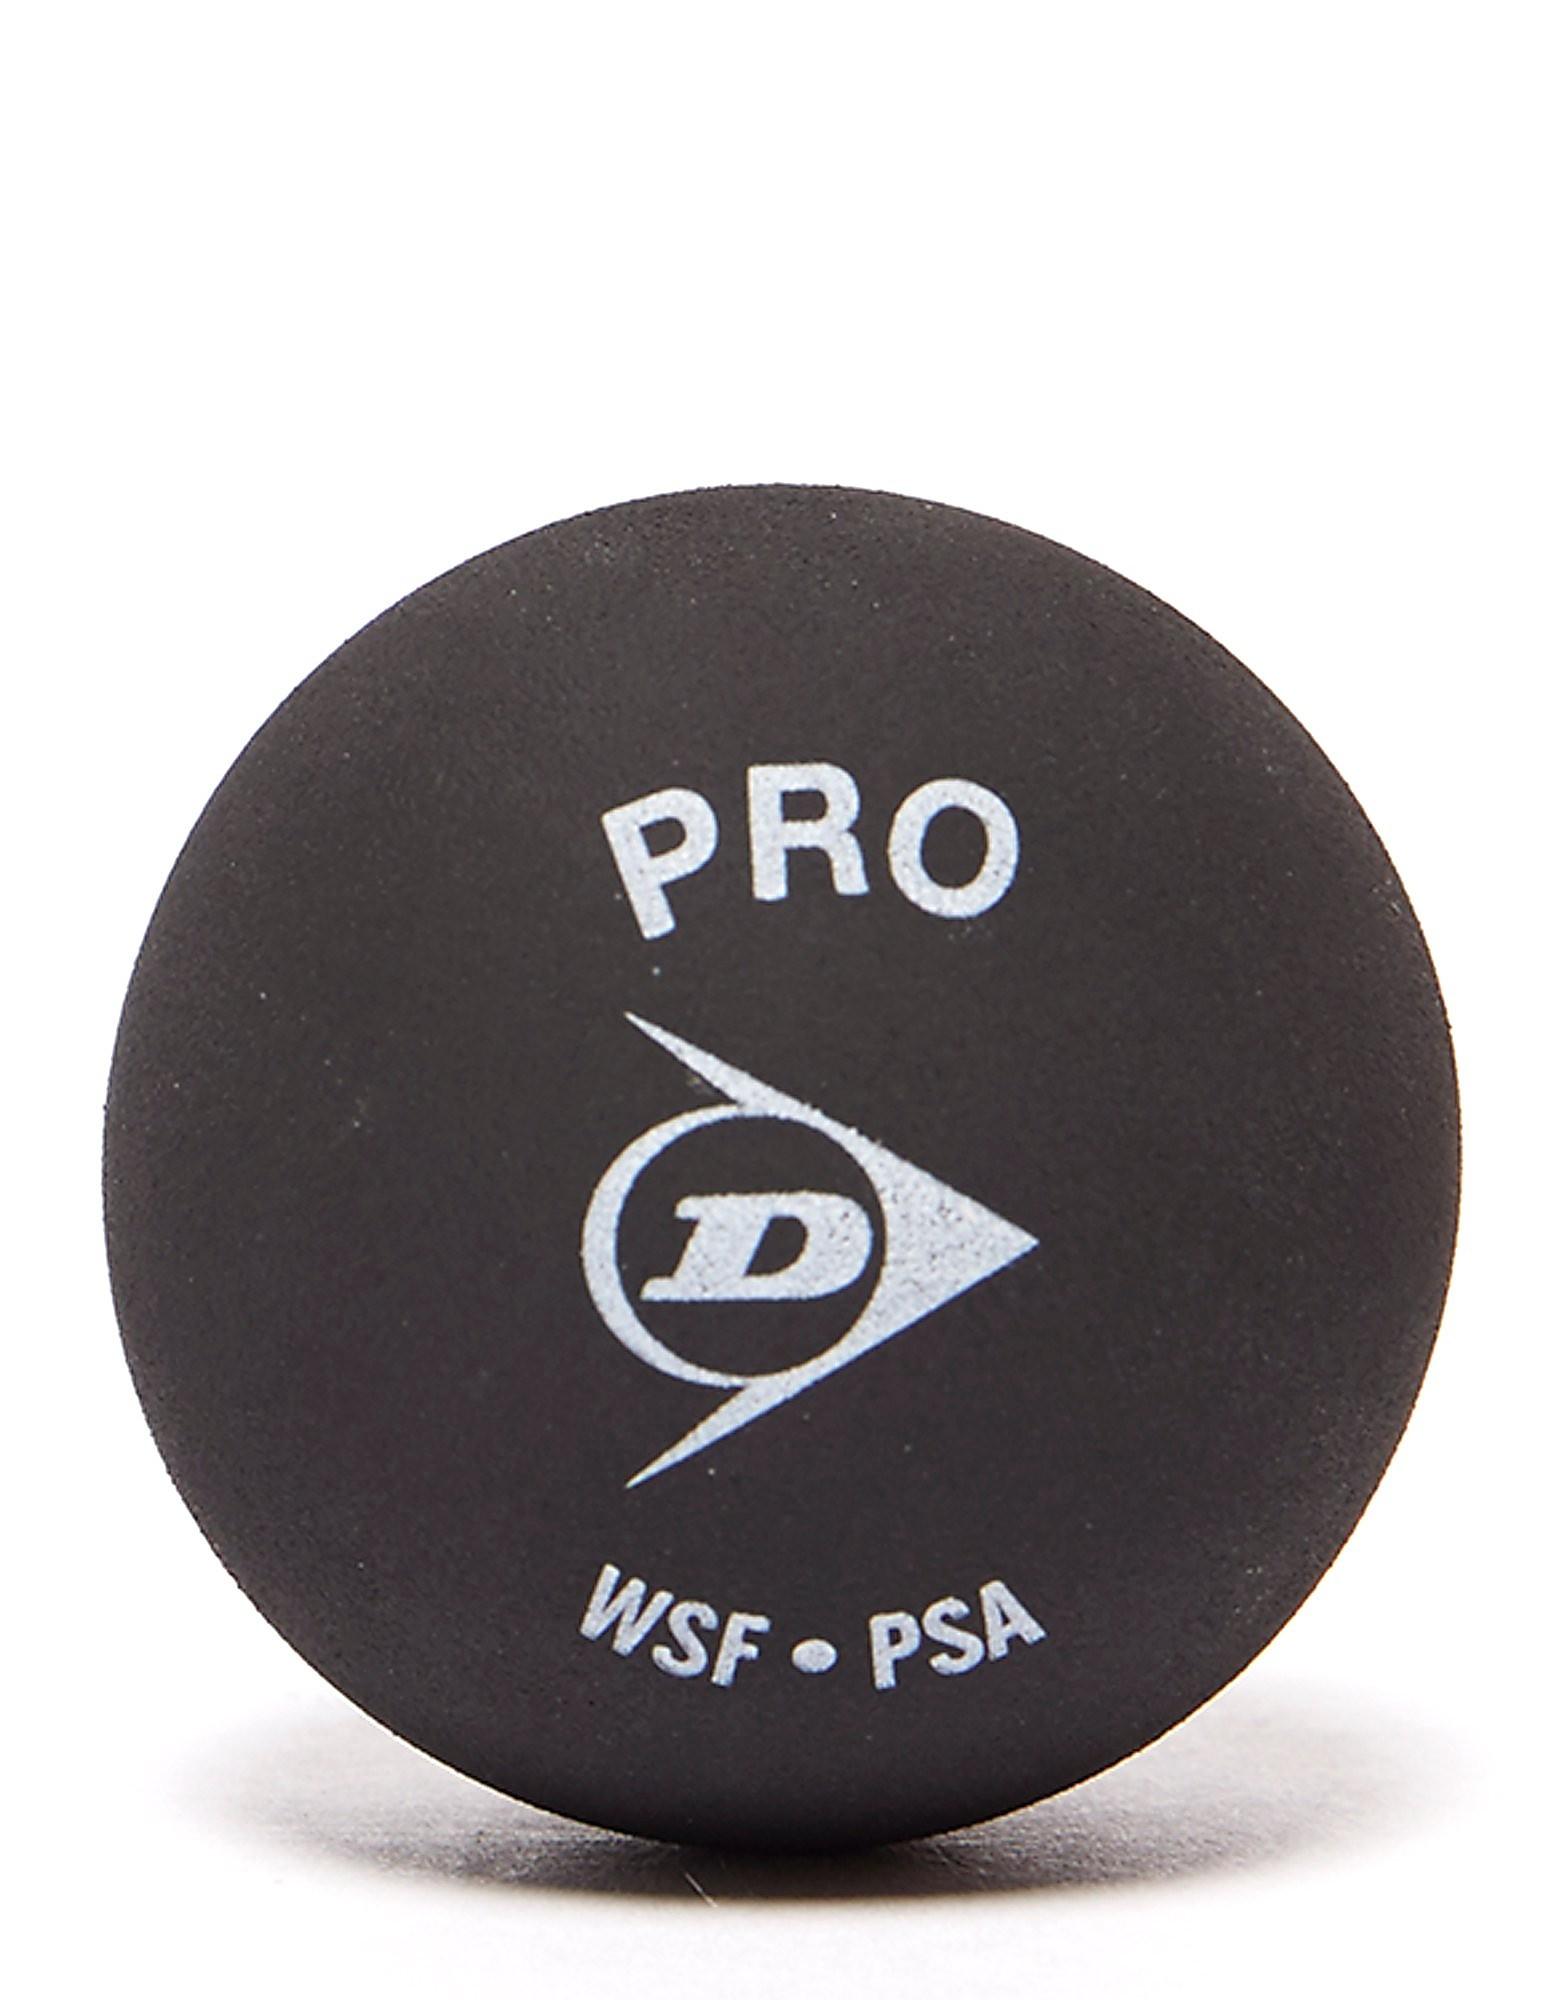 Dunlop Revelation Pro Squash Ball